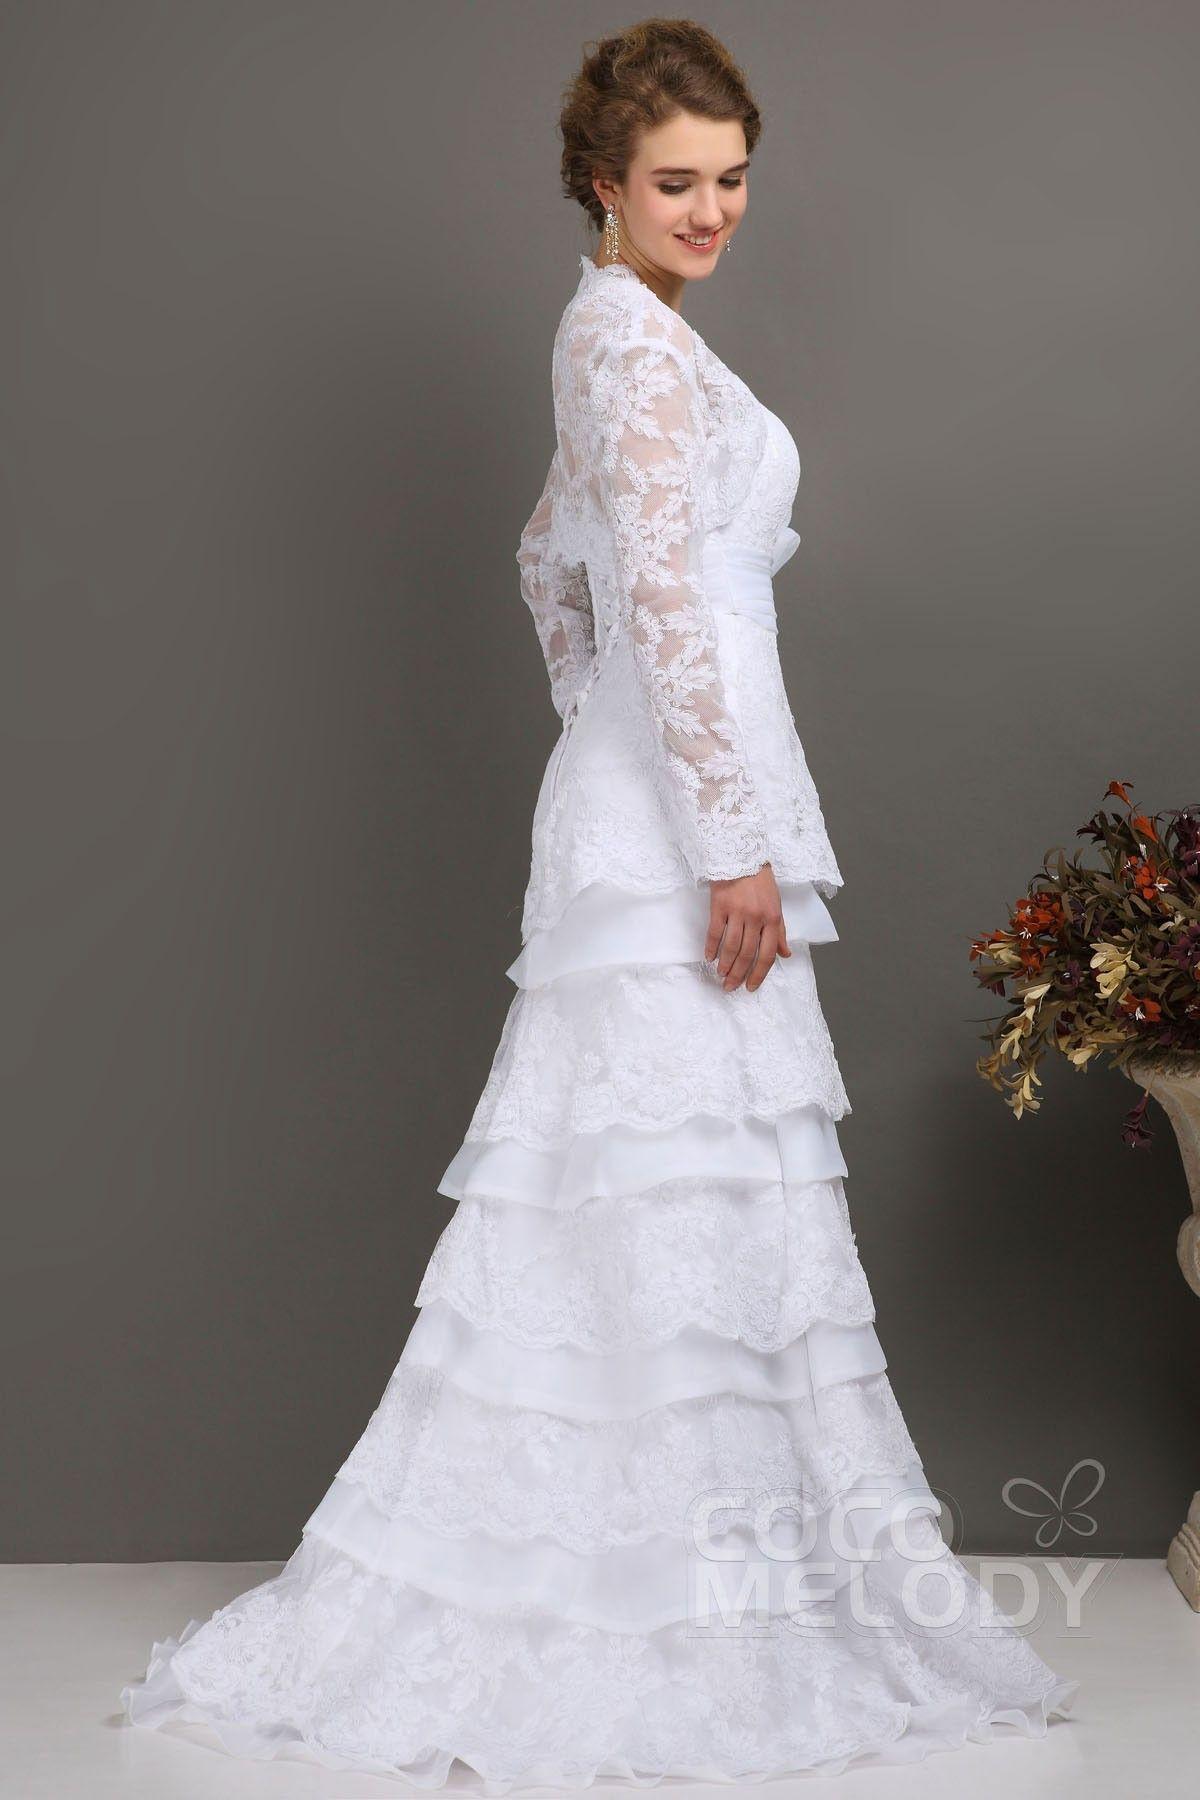 Lace dress jacket  New Style SheathColumn Sweetheart SweepBrush Train Lace Wedding